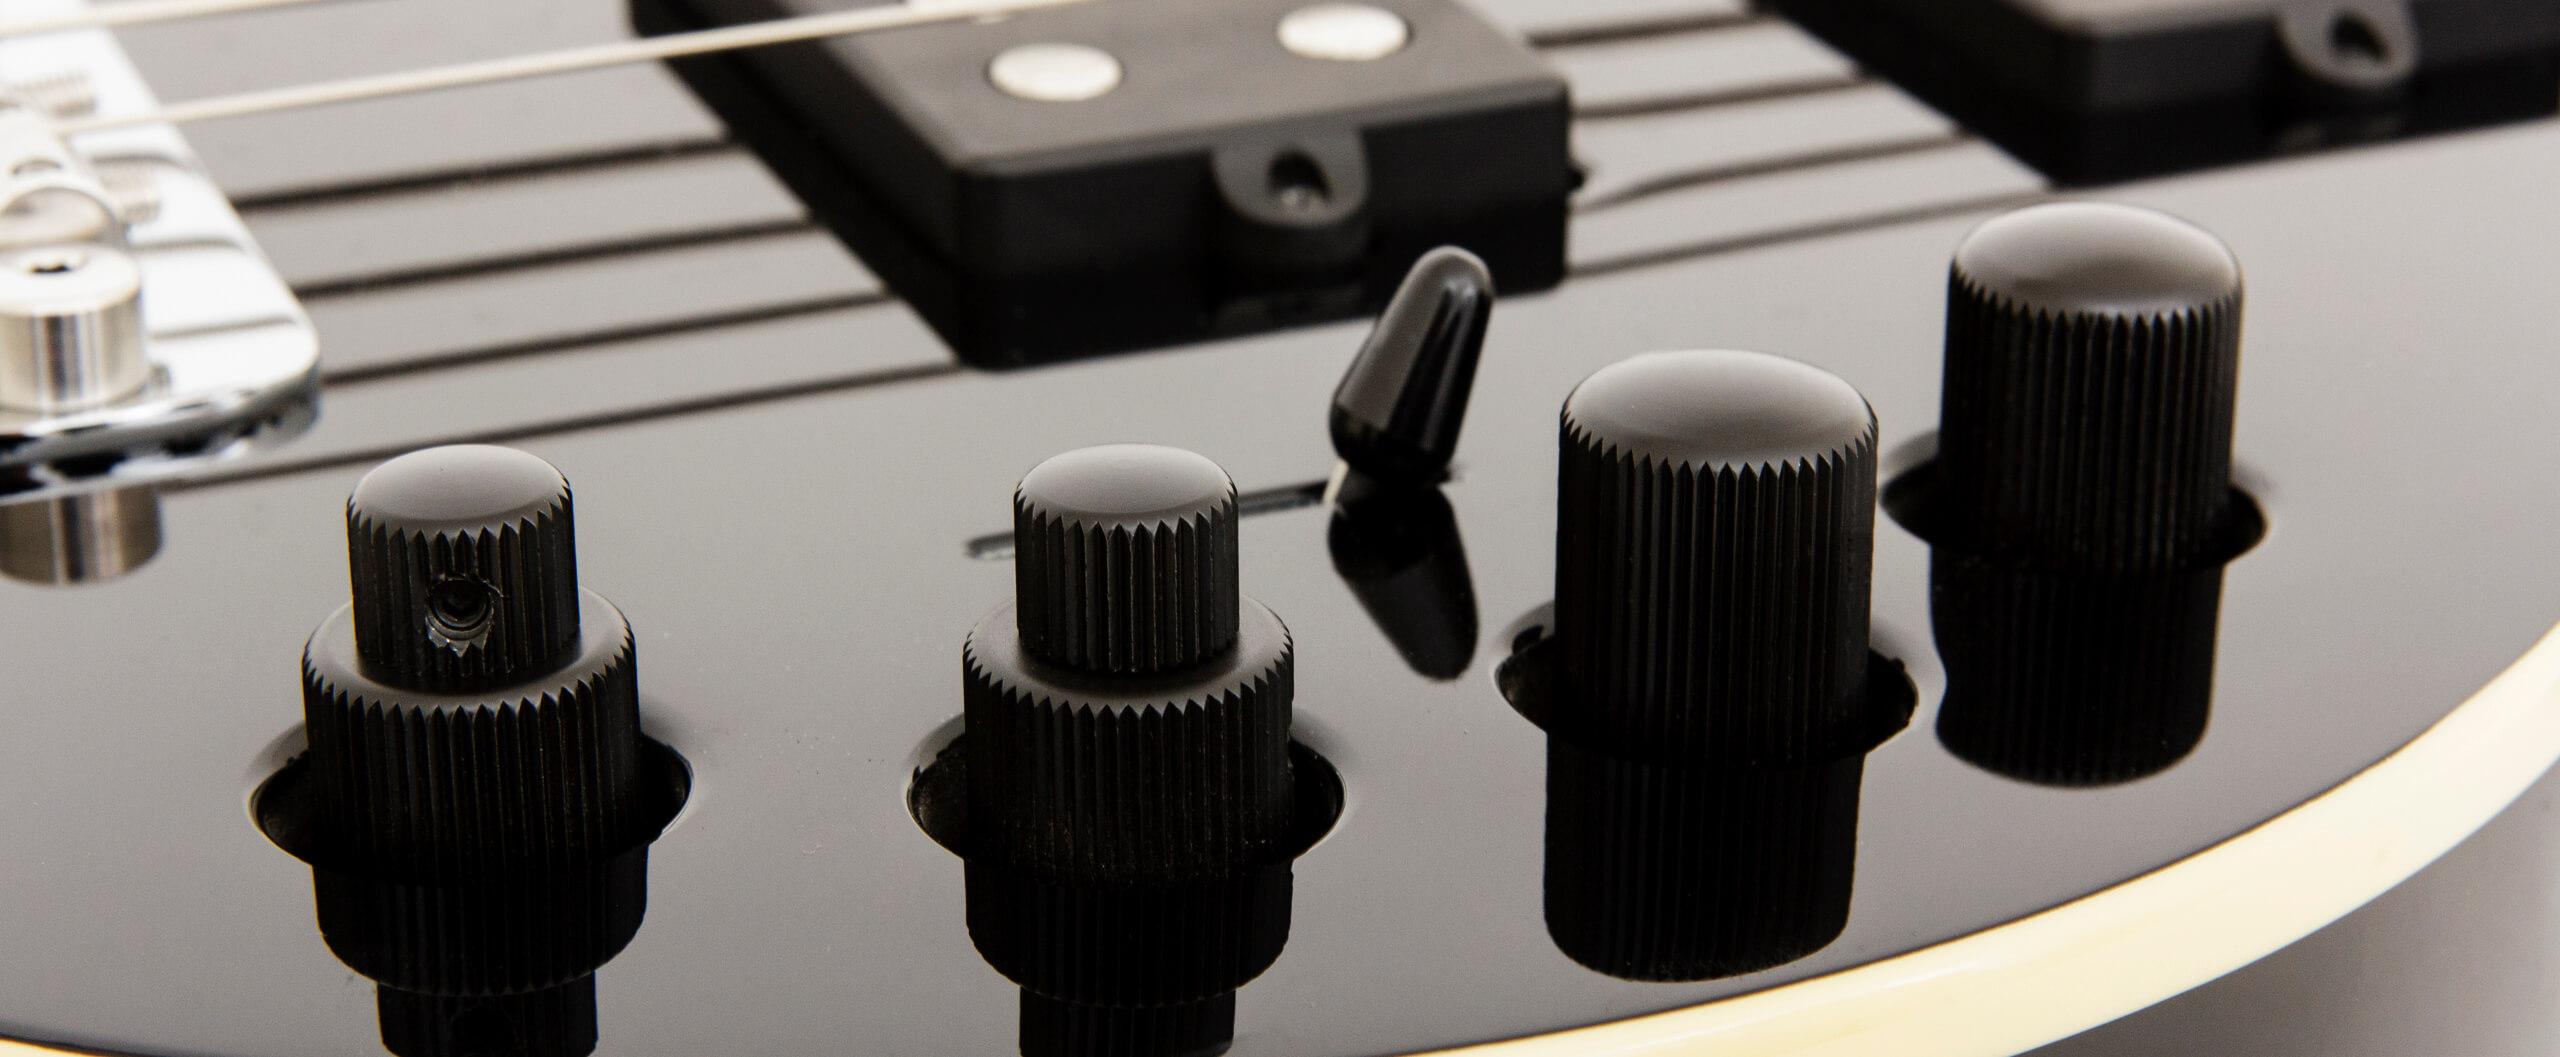 The Game Changer Bass Slide